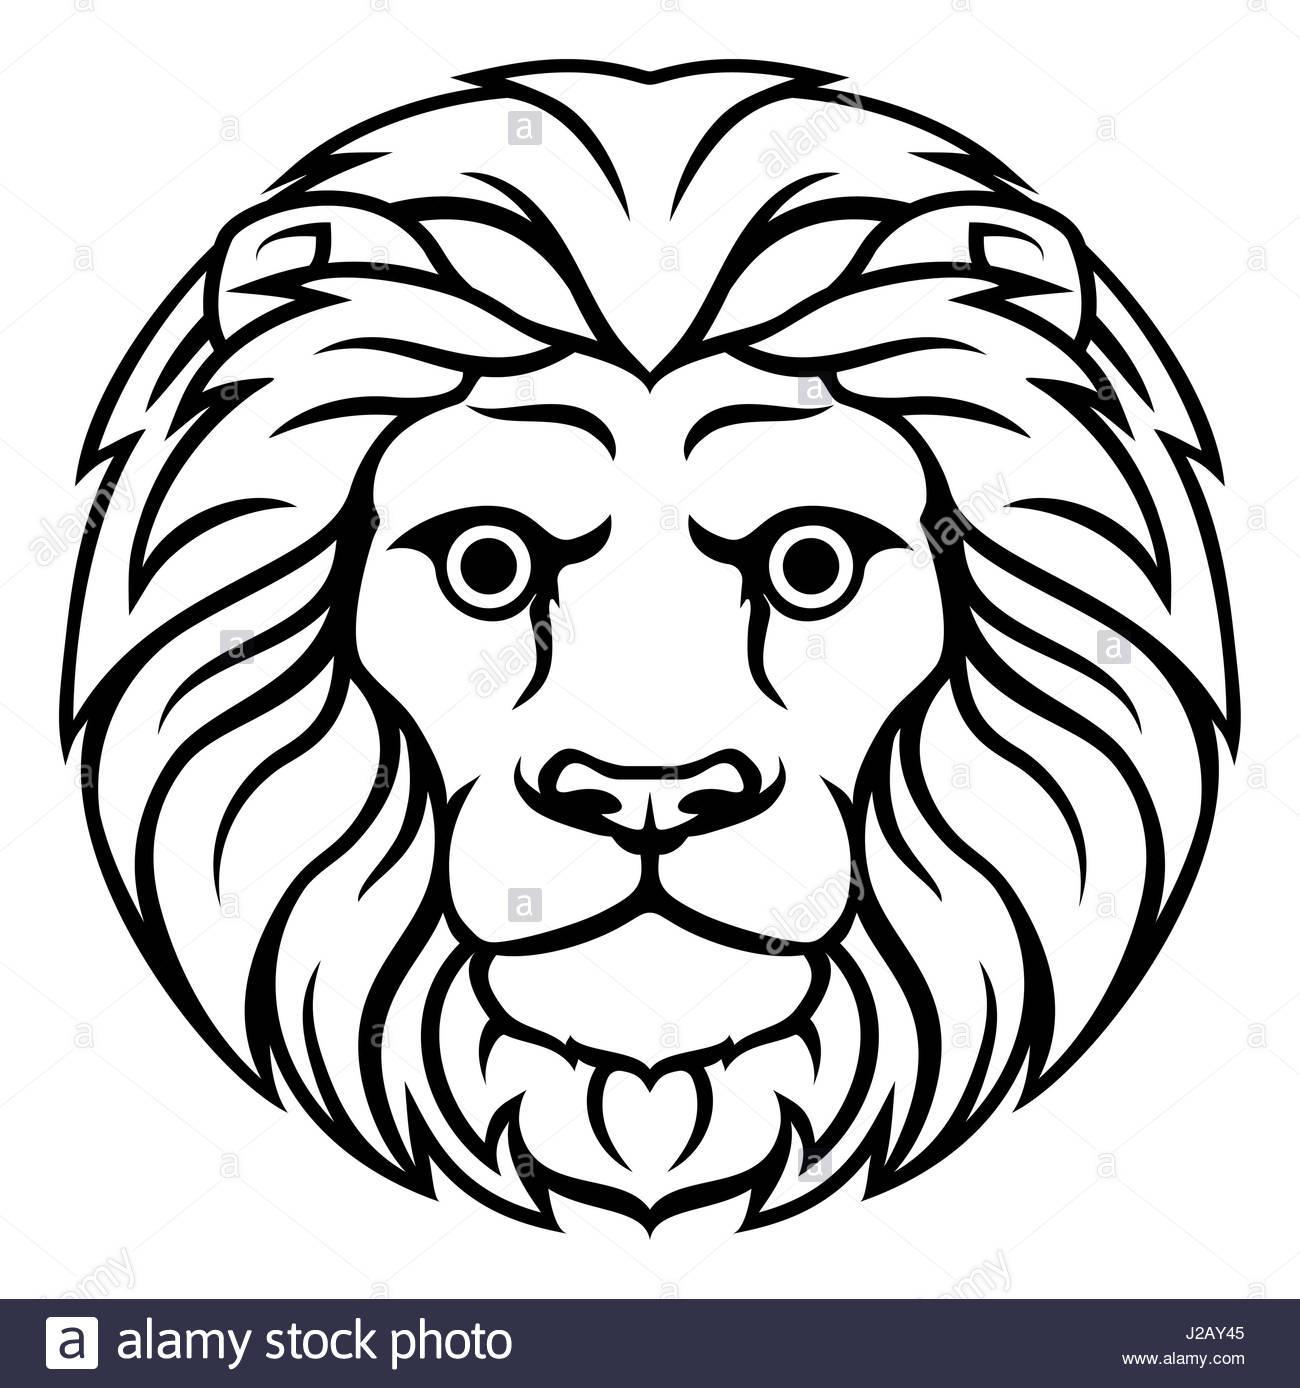 1300x1388 Astrology Horoscope Zodiac Signs, Circular Leo Lion Symbol Stock